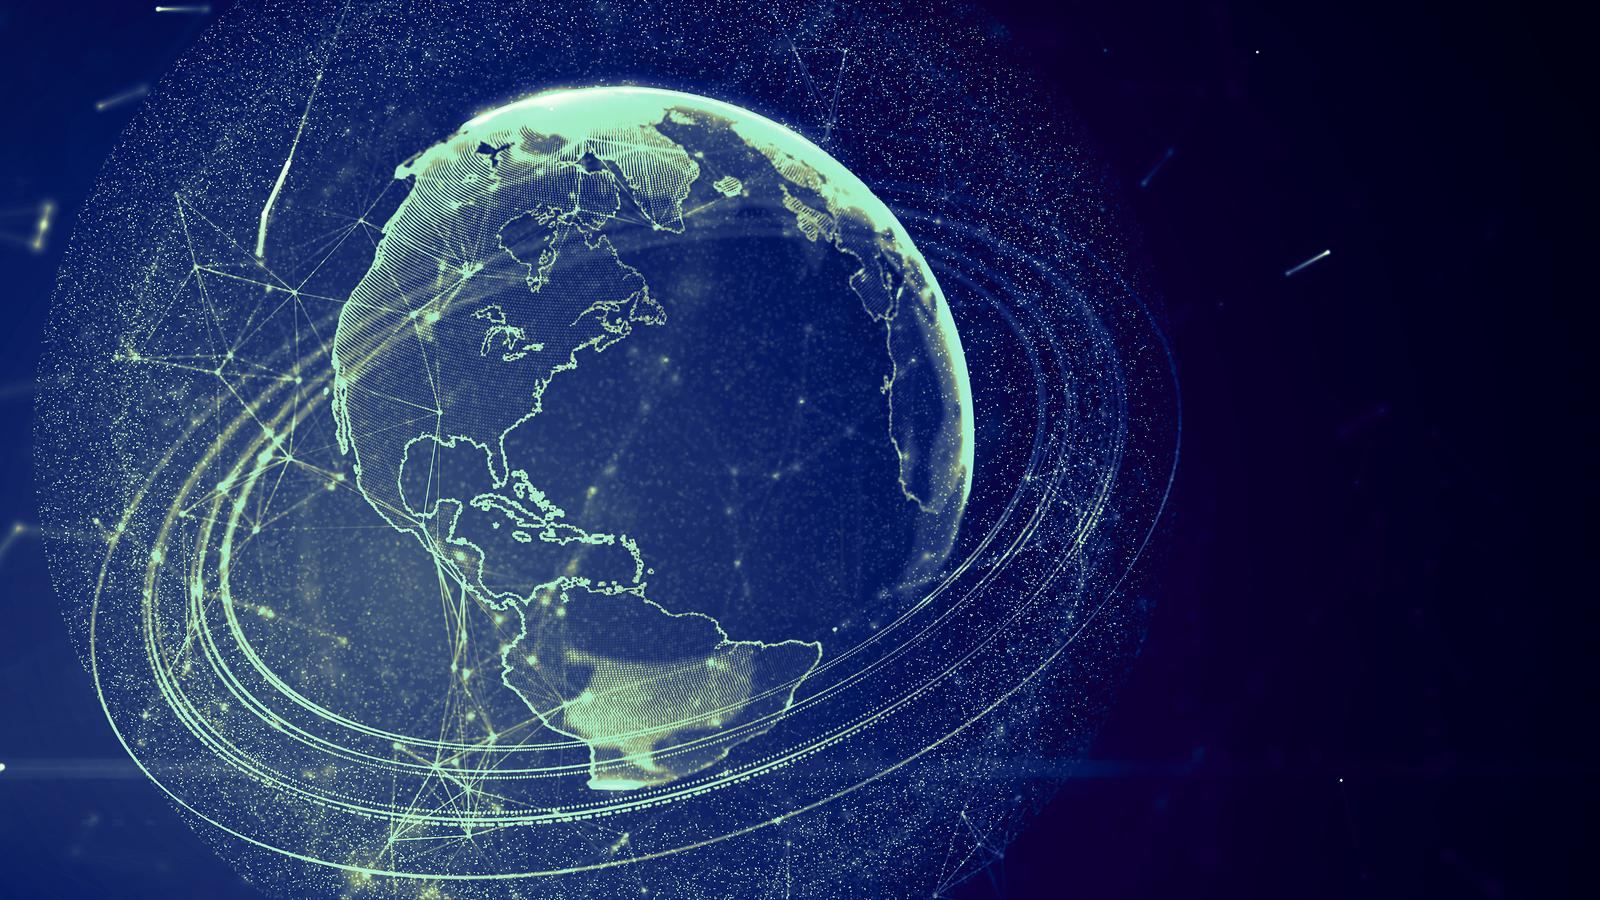 Detailed Virtual Planet Earthmatthewdsegall